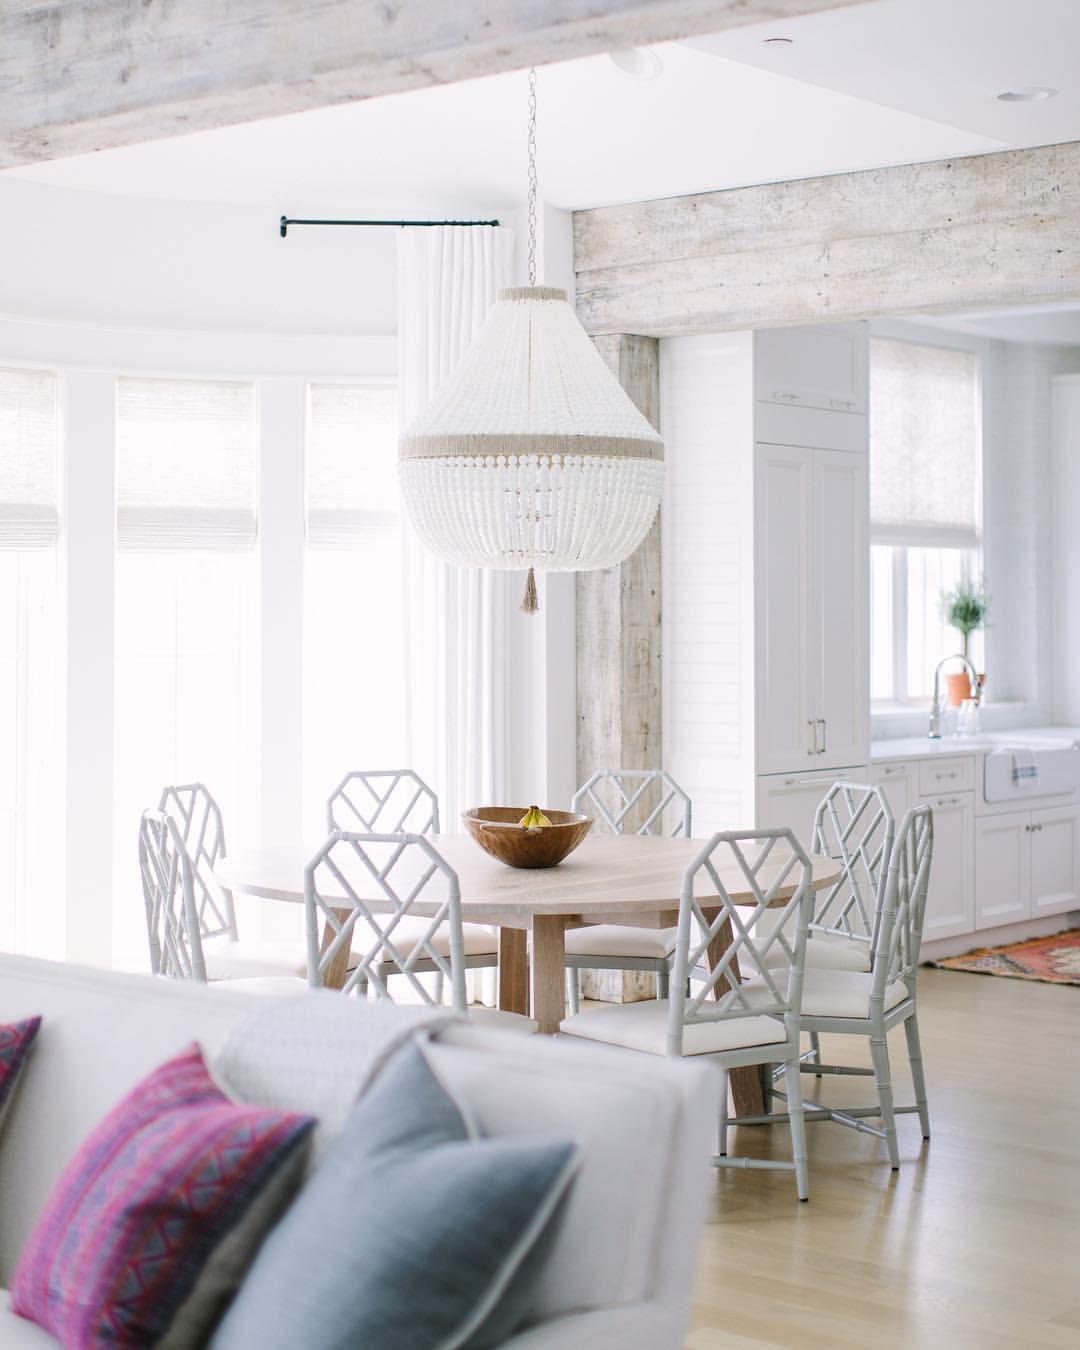 Nook Dining Room Ideas: Modern Farmhouse Interiors